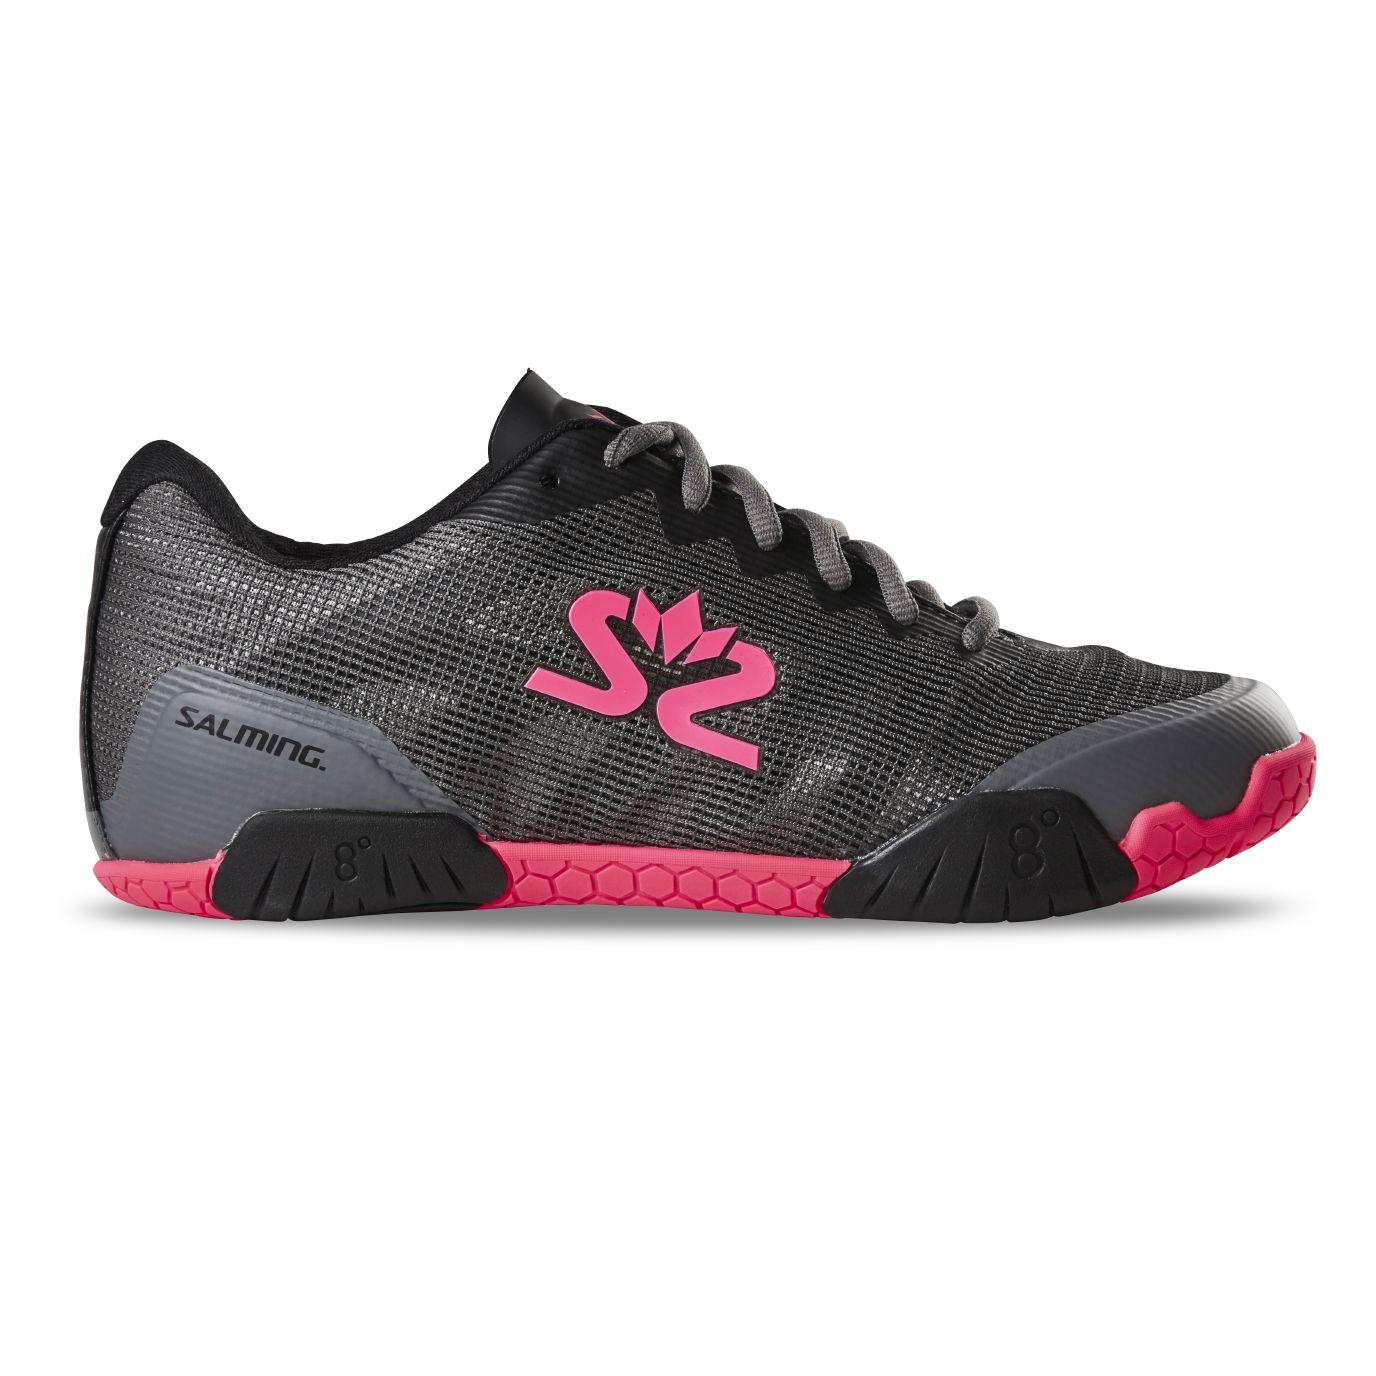 Salming Hawk Shoe Women GunMetal/Pink 7,5 UK - 41 1/3 EUR - 26,5 cm